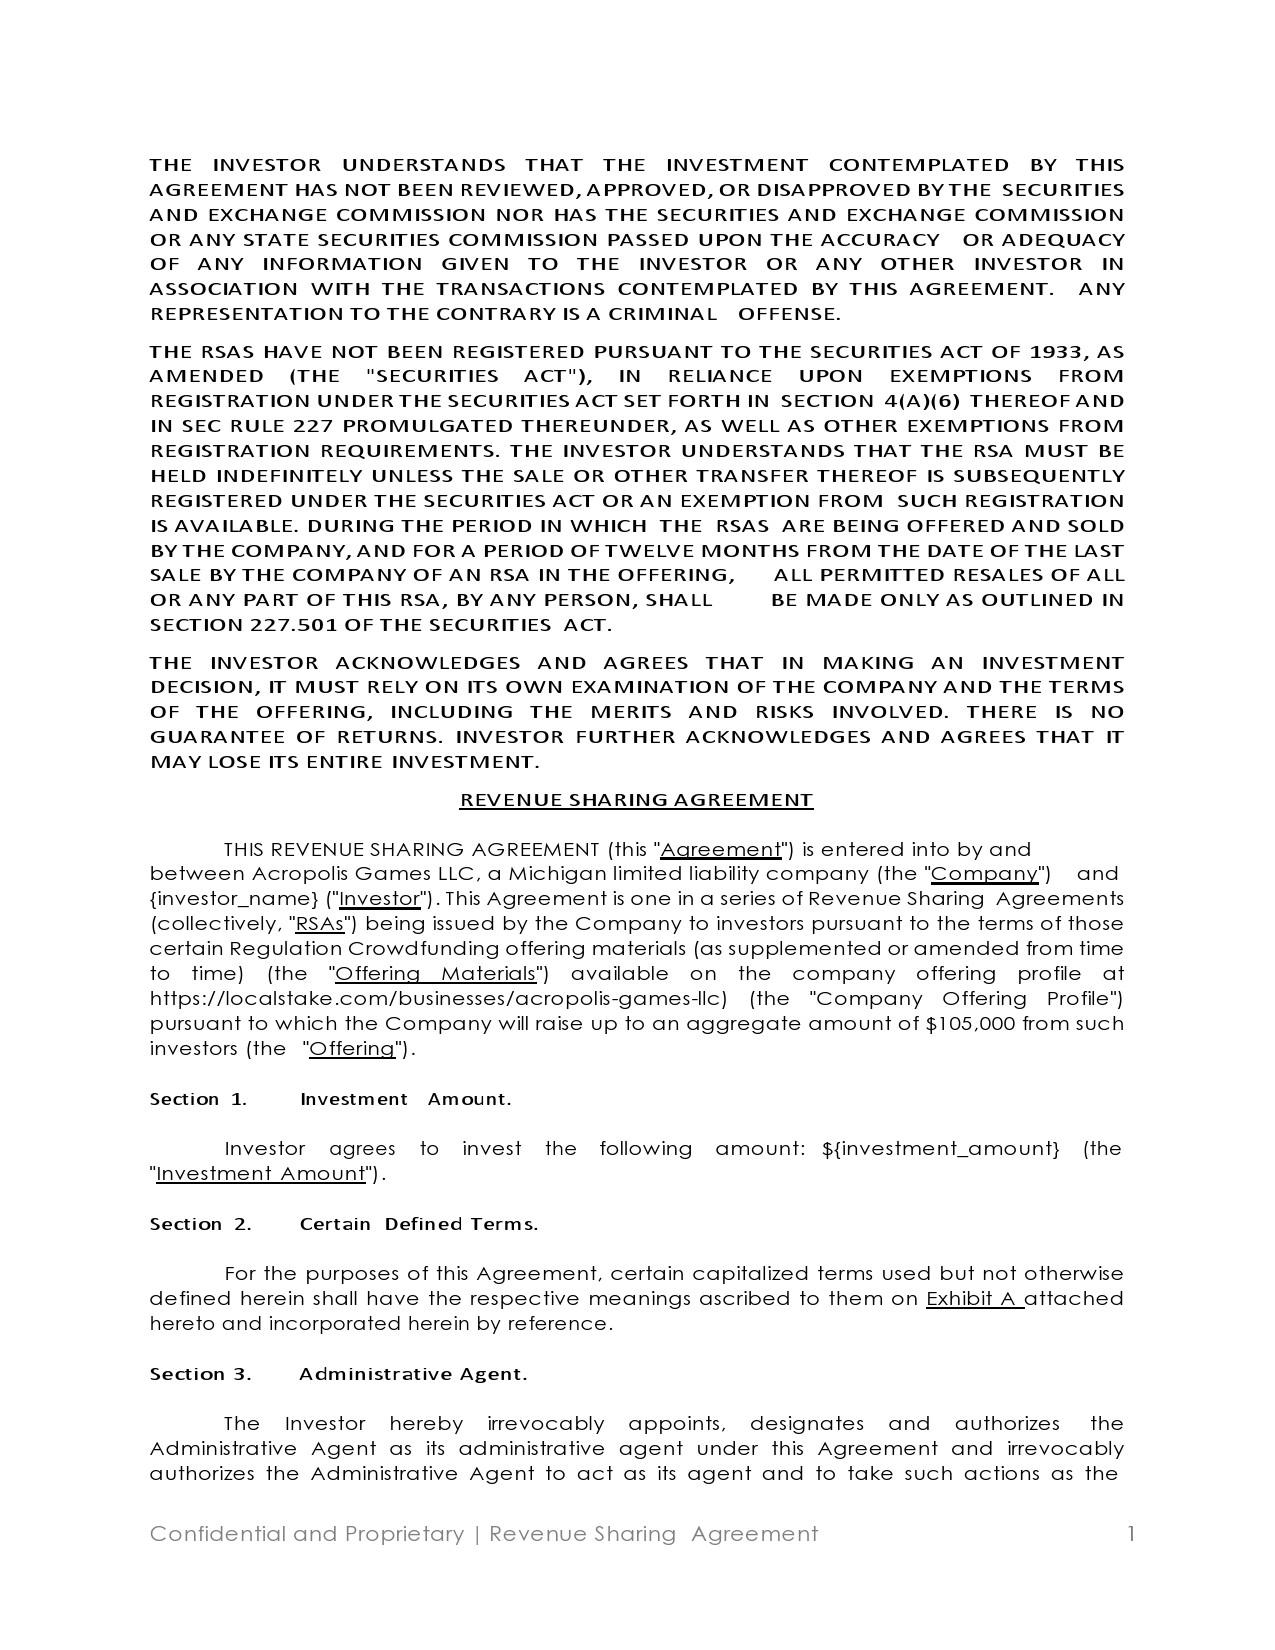 Free profit sharing agreement 05